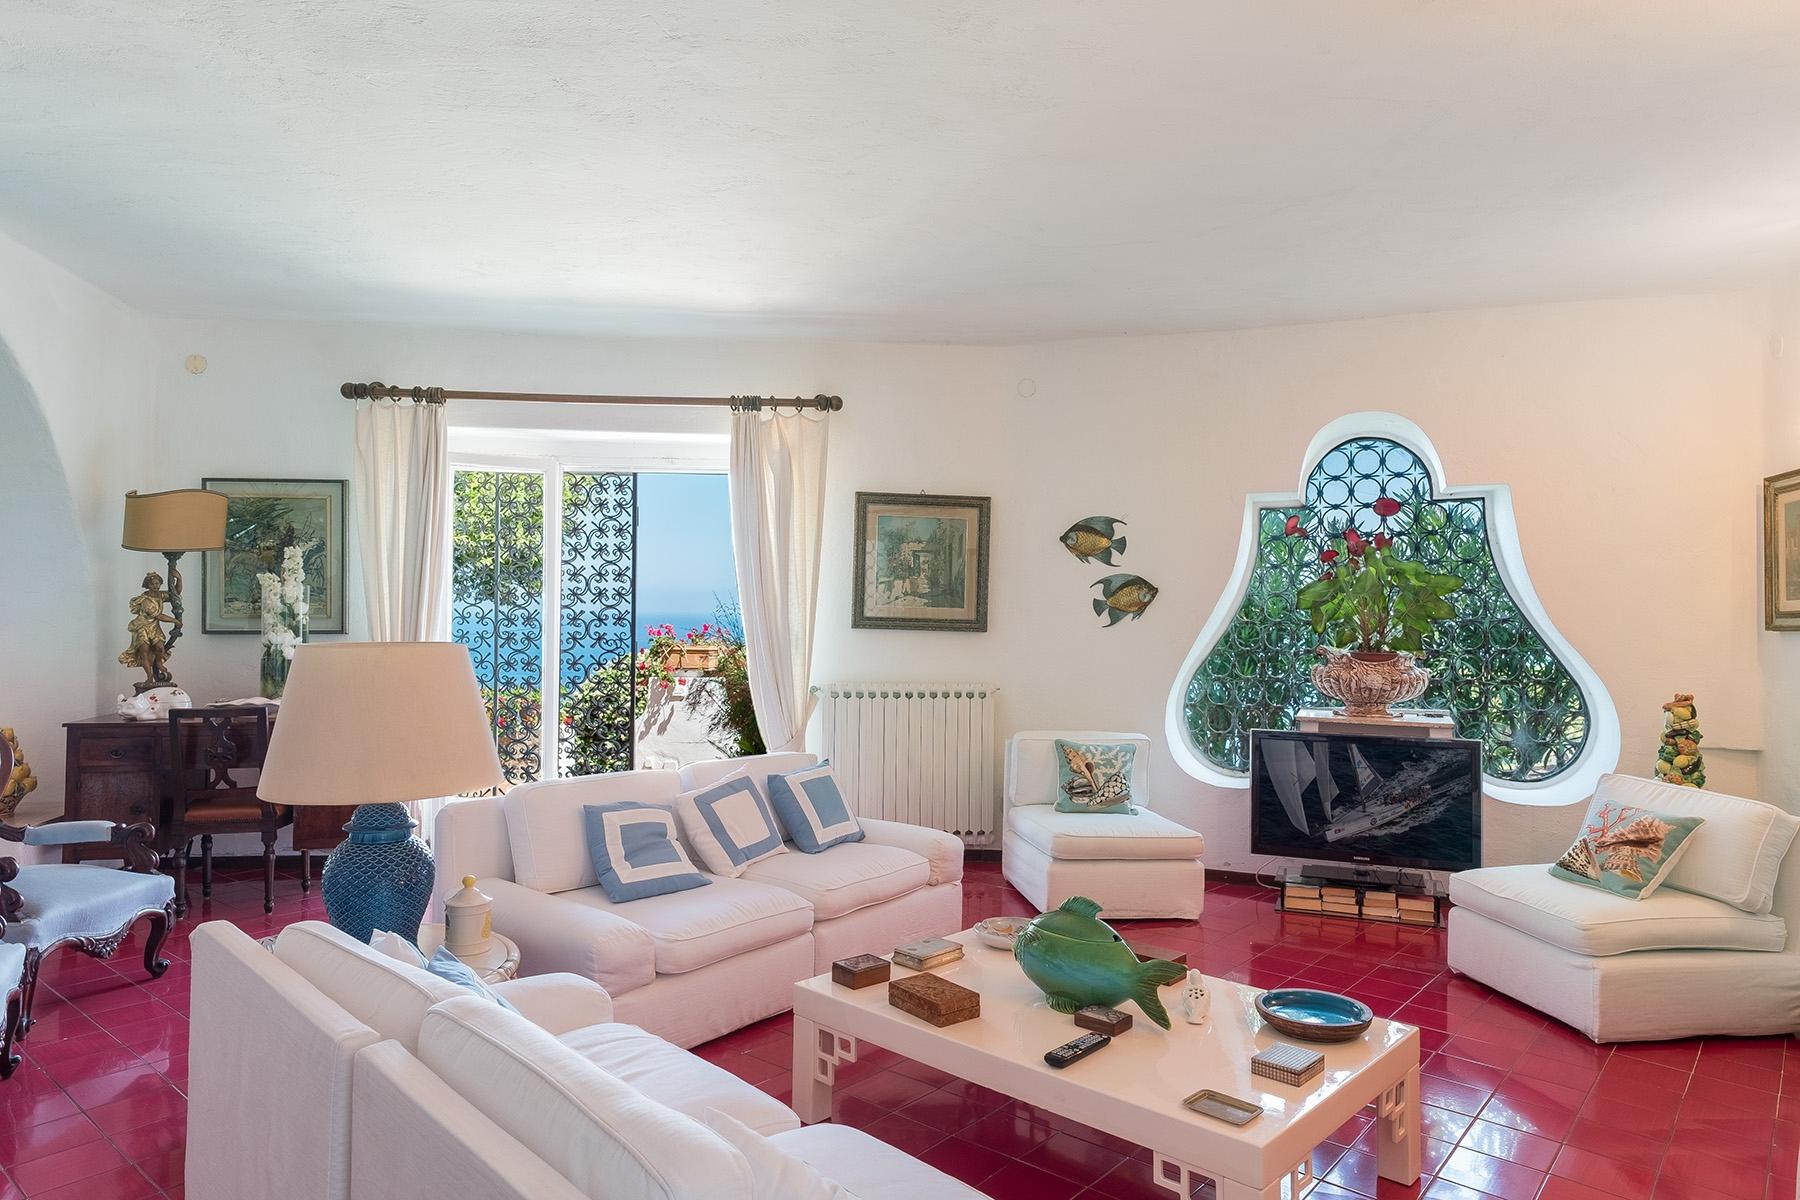 Villa in Vendita a Ischia: 5 locali, 206 mq - Foto 2